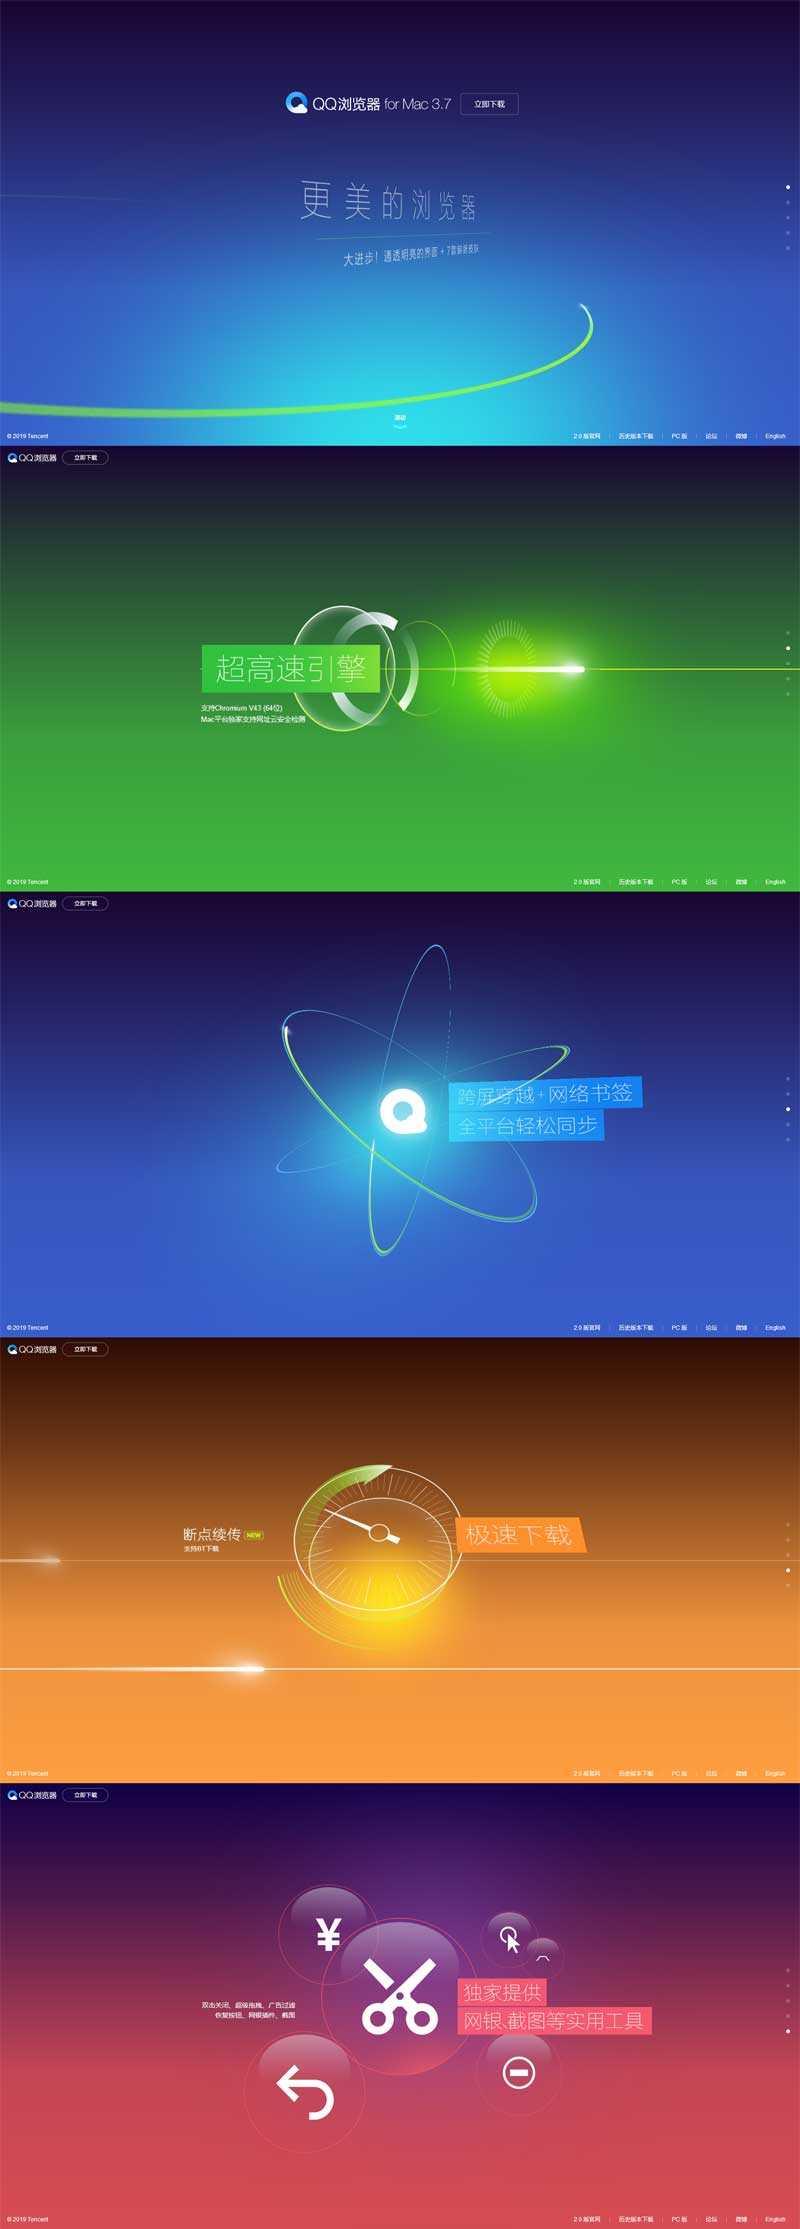 qq浏览器下载官网模板